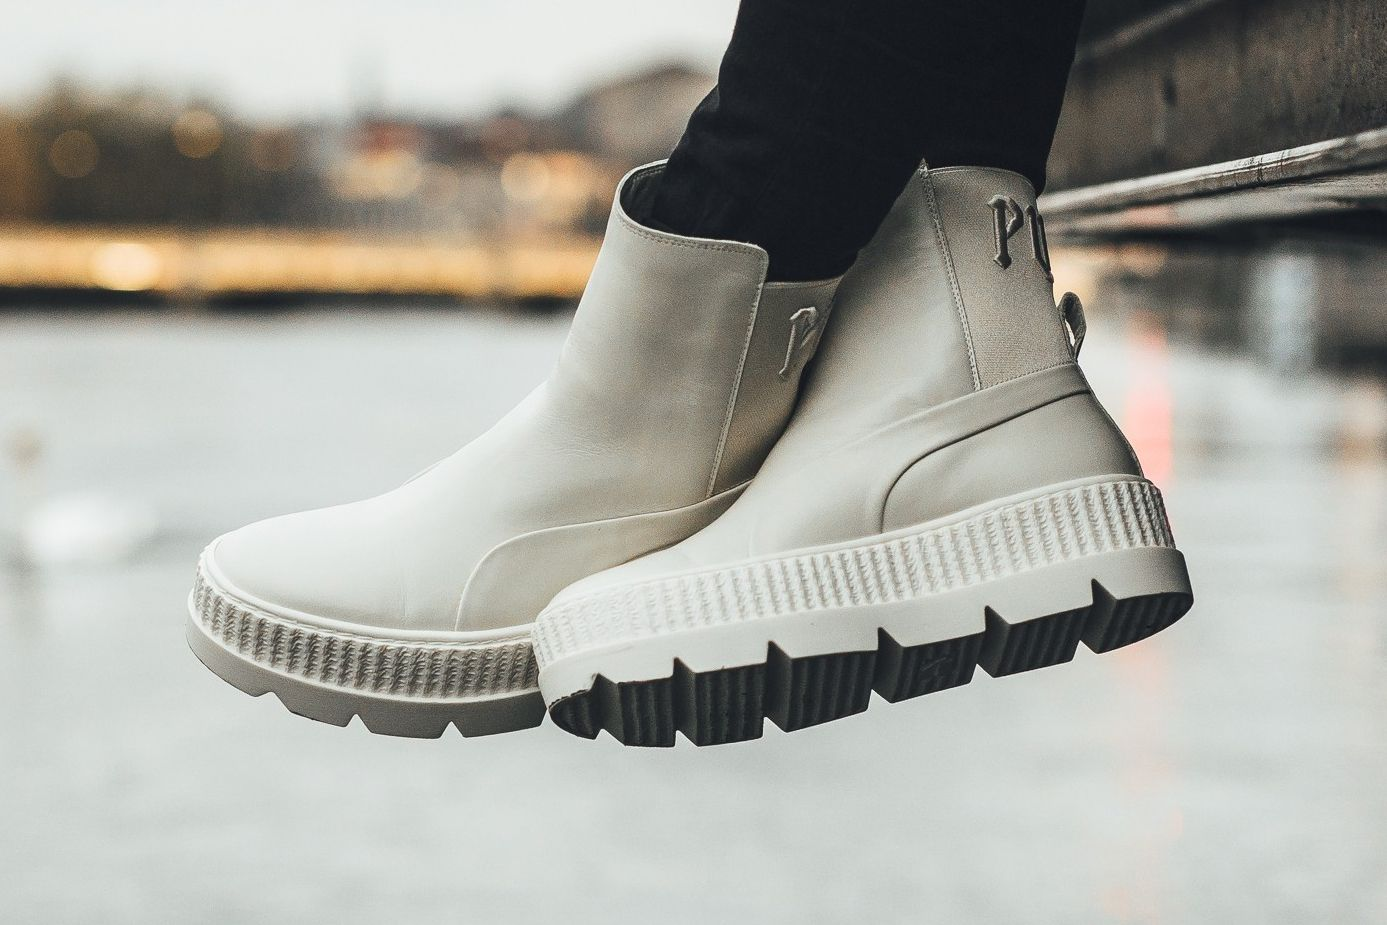 b20dc73a5ec197 Rihanna s Fenty PUMA Chelsea Sneaker Boot Drops in